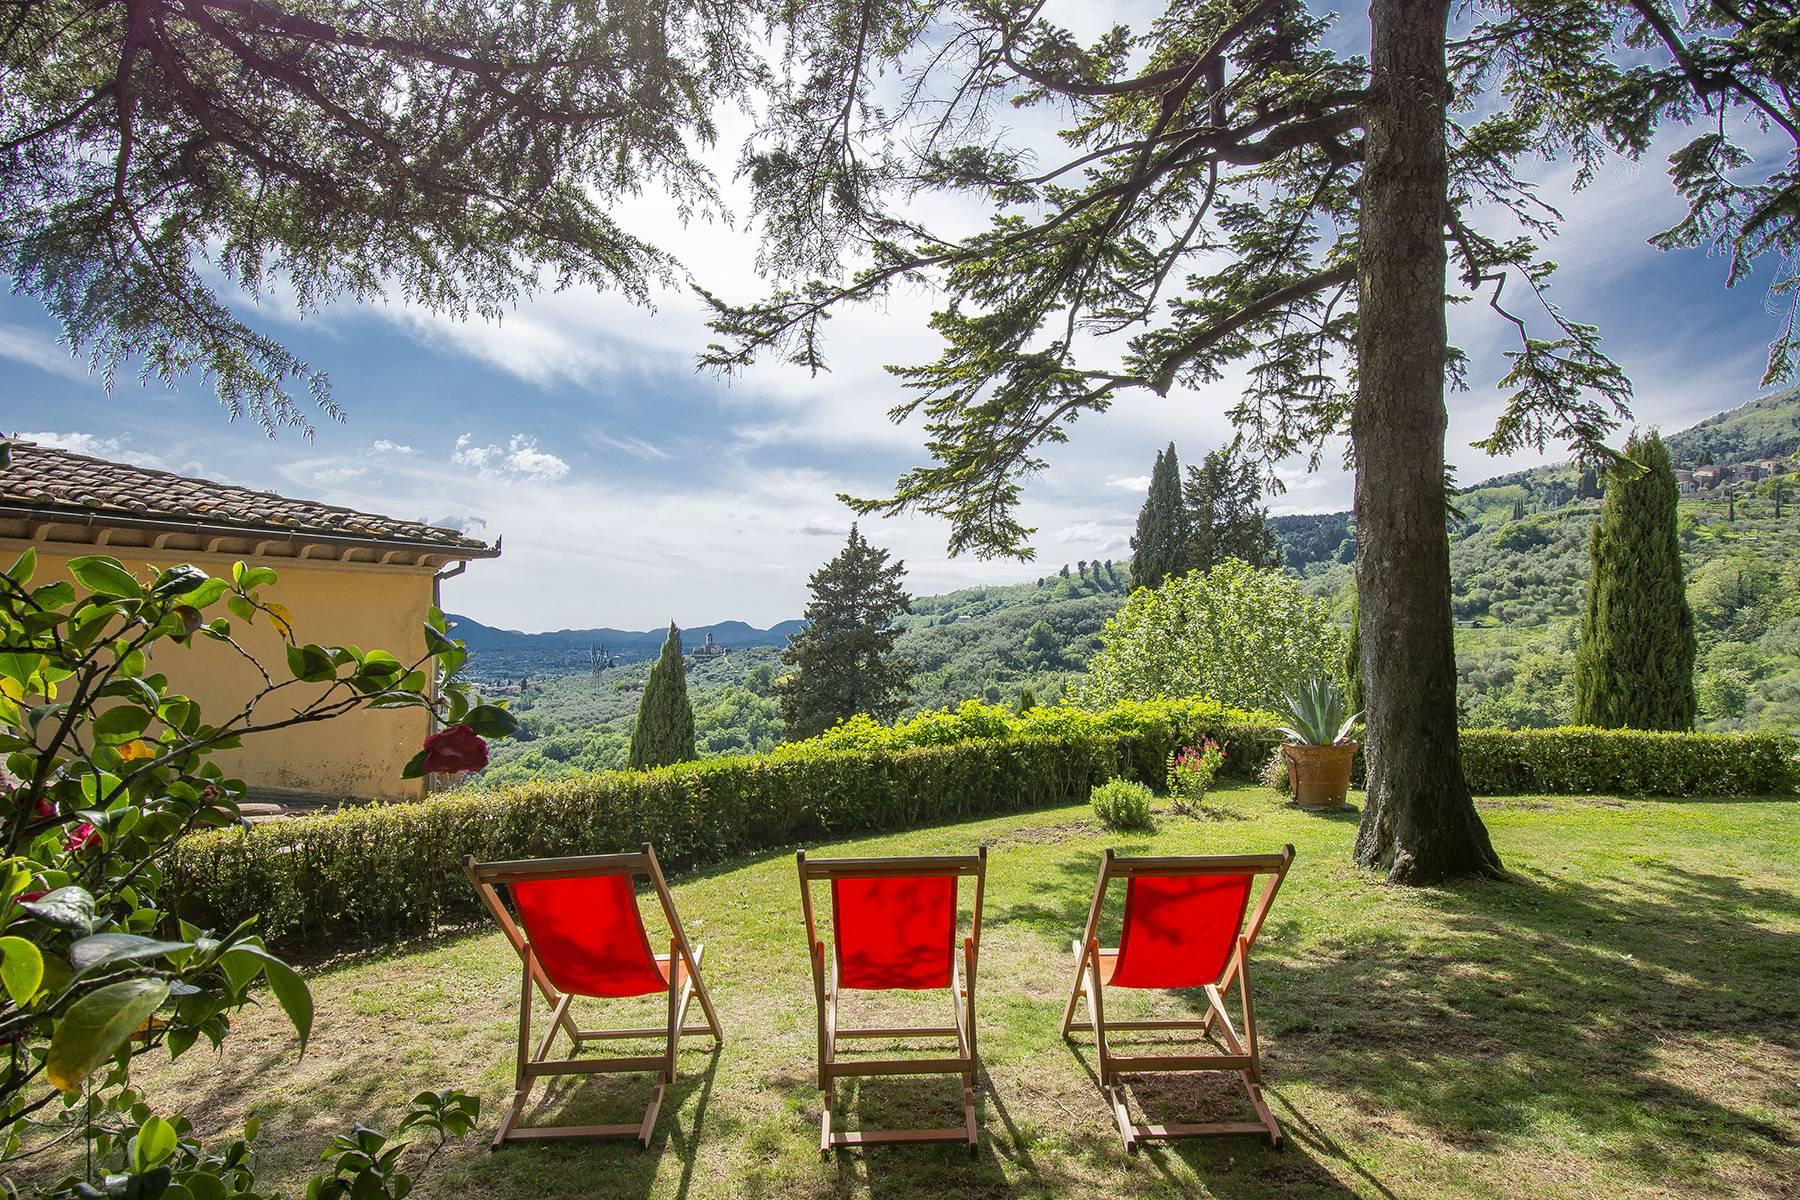 Villa in Vendita a Capannori: 5 locali, 380 mq - Foto 1